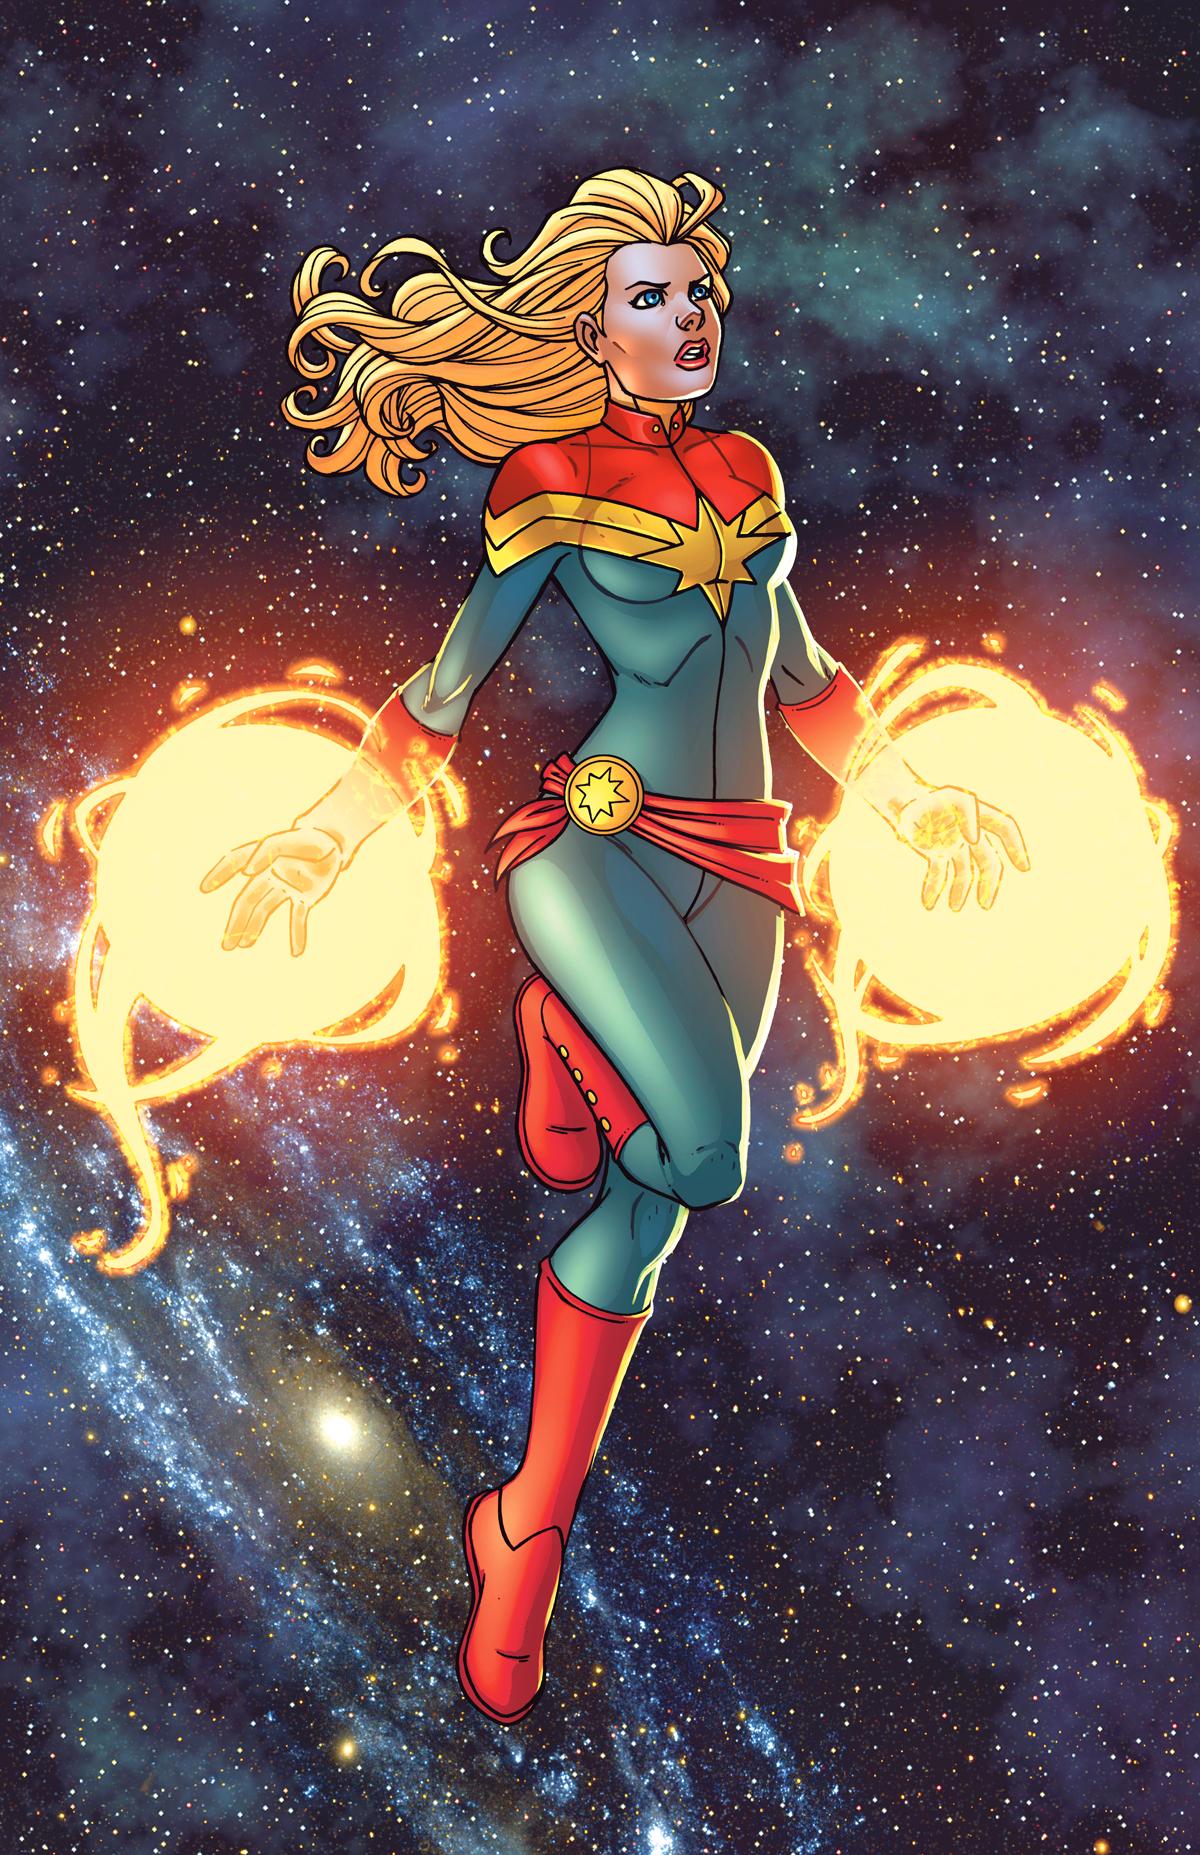 Captain Marvel Wallpapers Comics Hq Captain Marvel Pictures 4k Wallpapers 2019